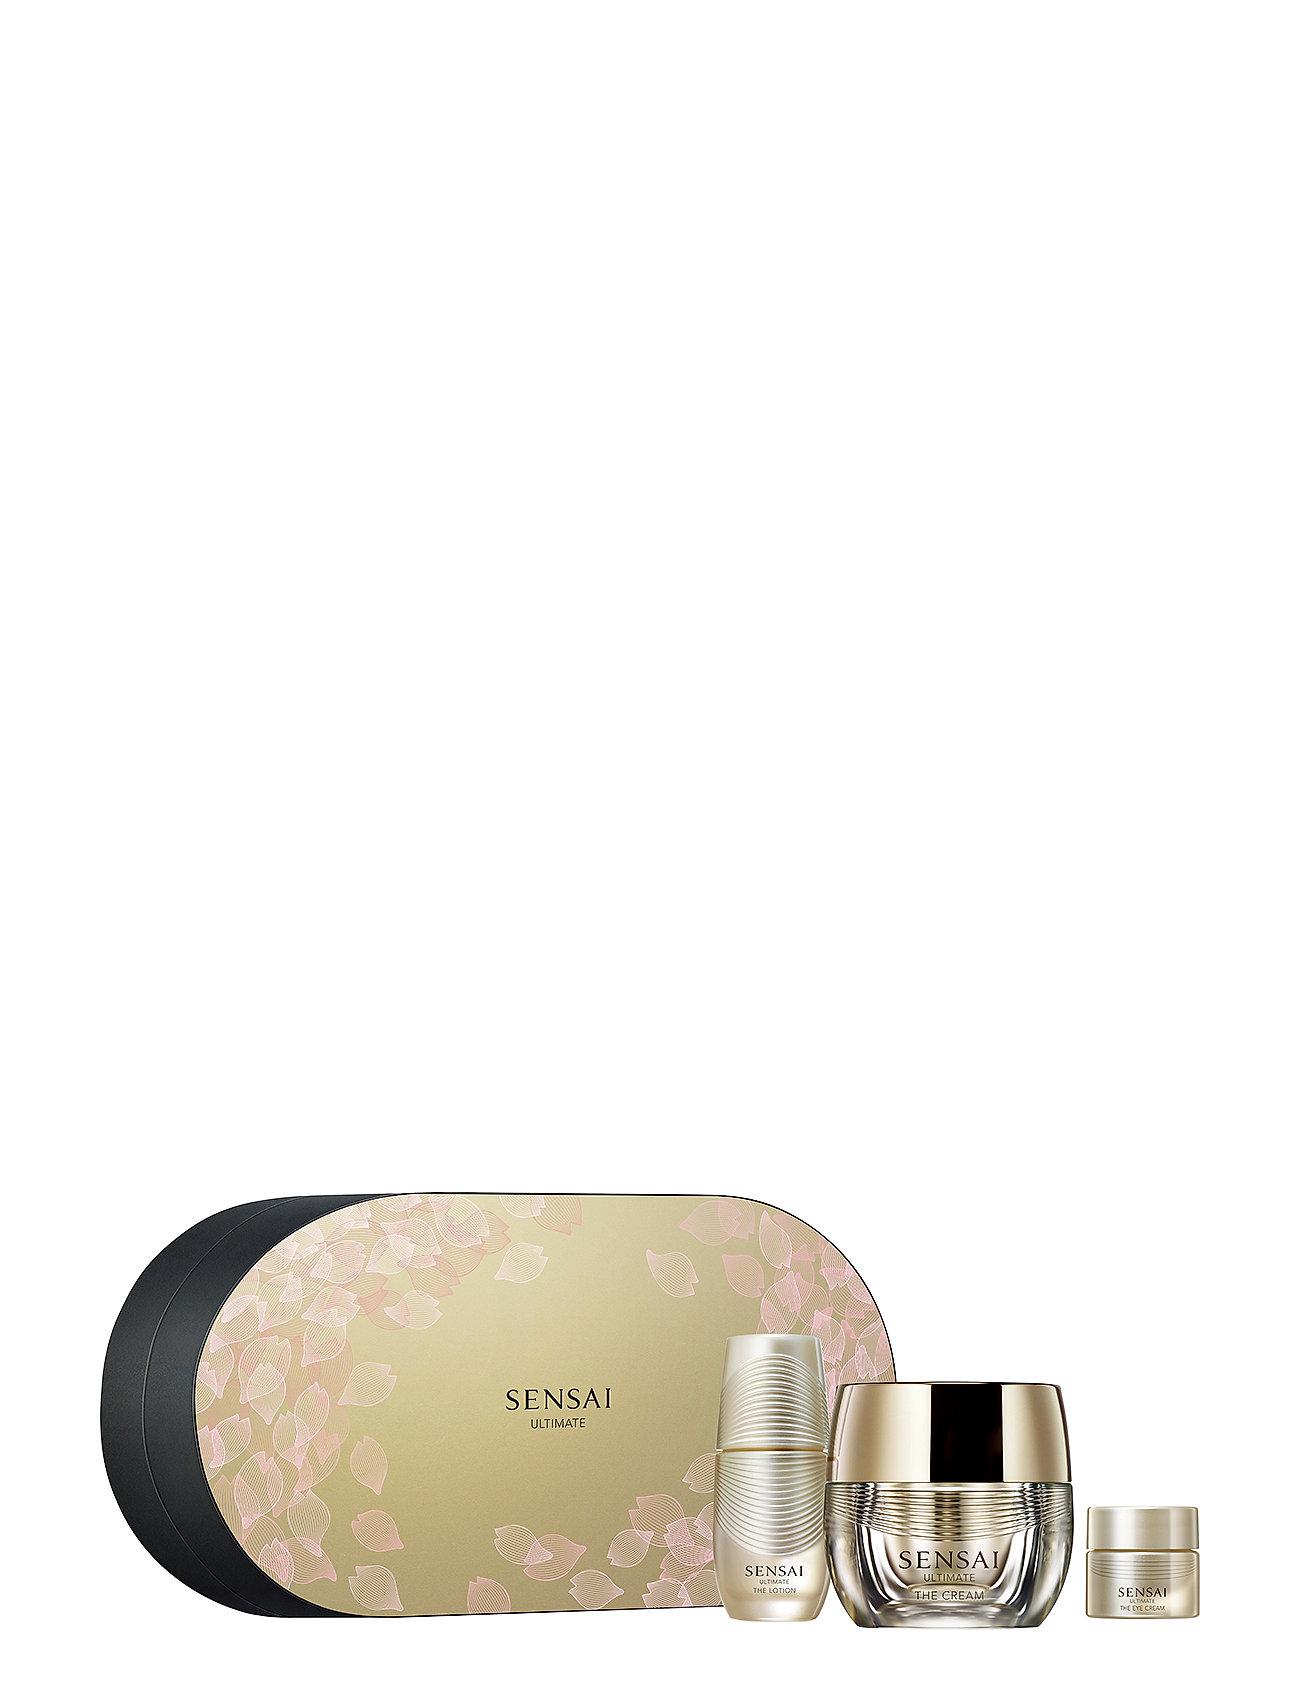 SENSAI Ultimate The Cream Limited Set - NO COLOR